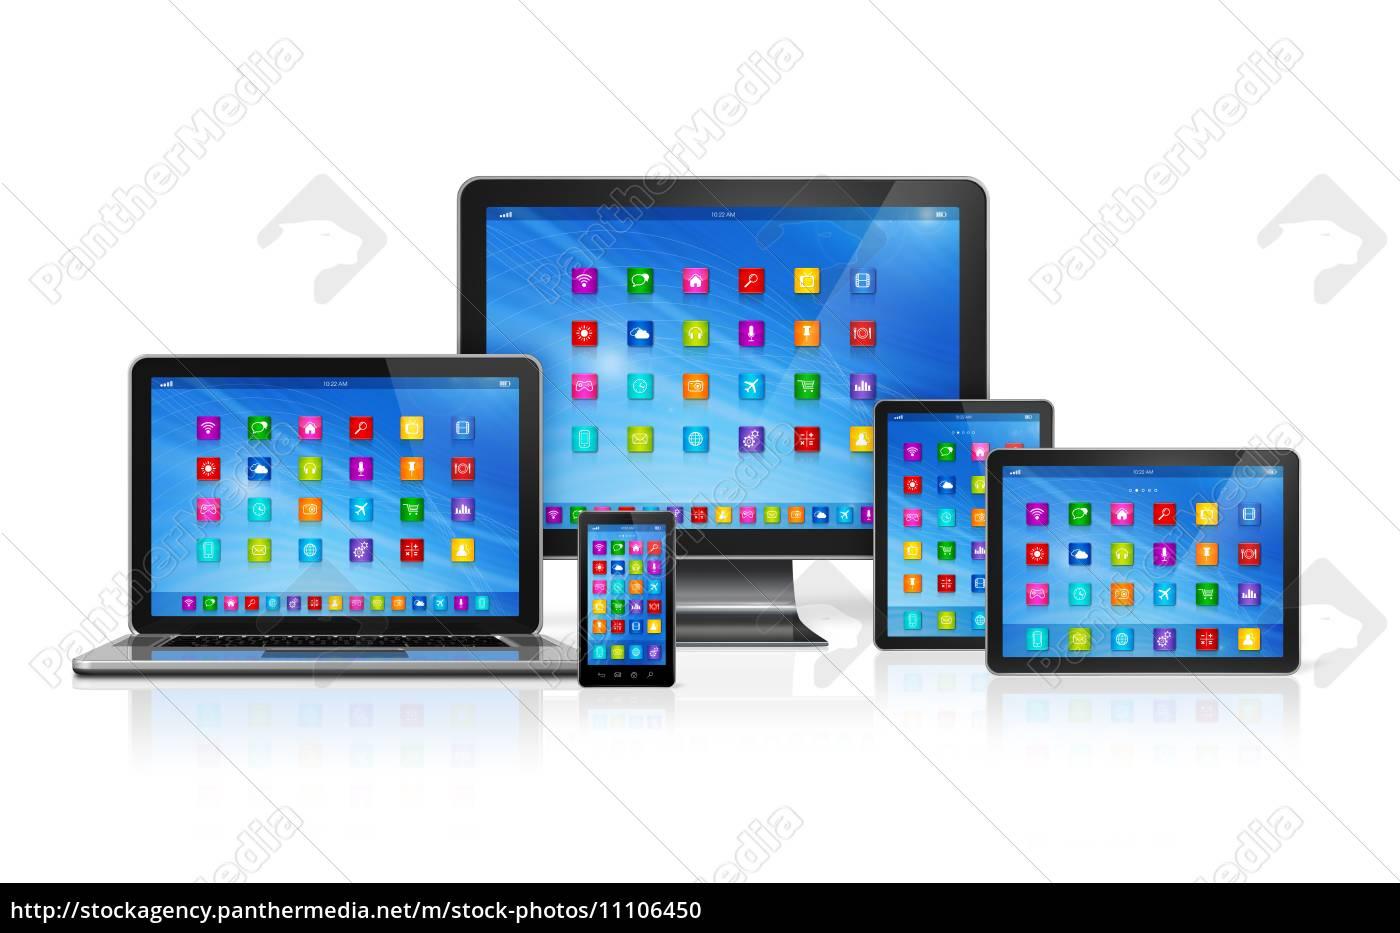 dispositivos, computer, set - 11106450